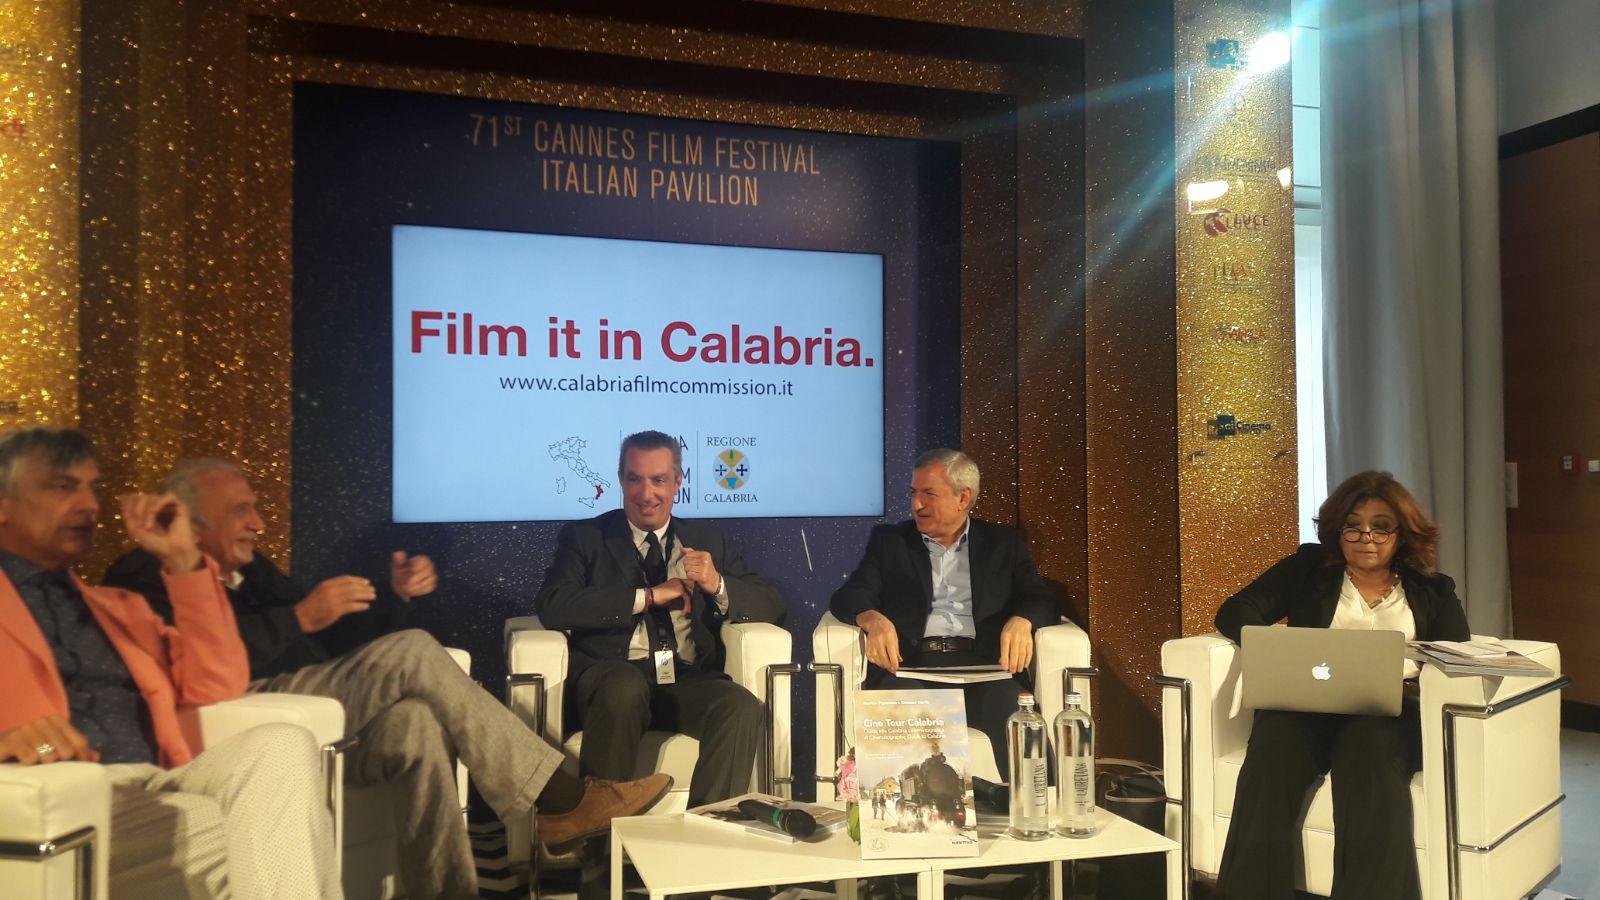 Cannes 2018: Marion Cotillard in bianco per